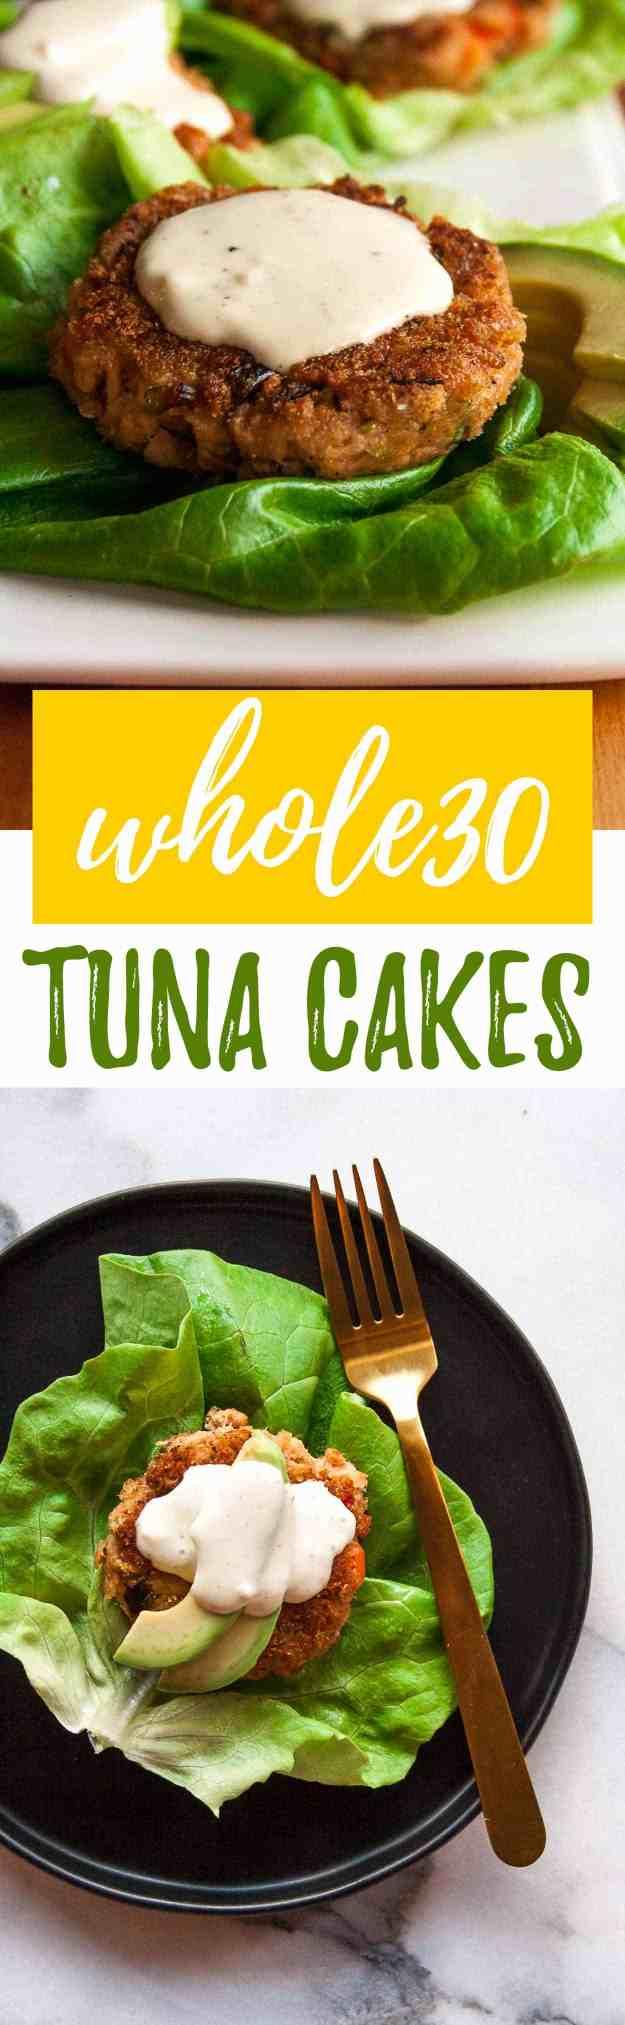 Whole30 Tuna Cakes with Lemon-Garlic Aioli | #whole30 #easy #recipe #healthy #lowcarb #paleo #glutenfree | hungrybynature.com